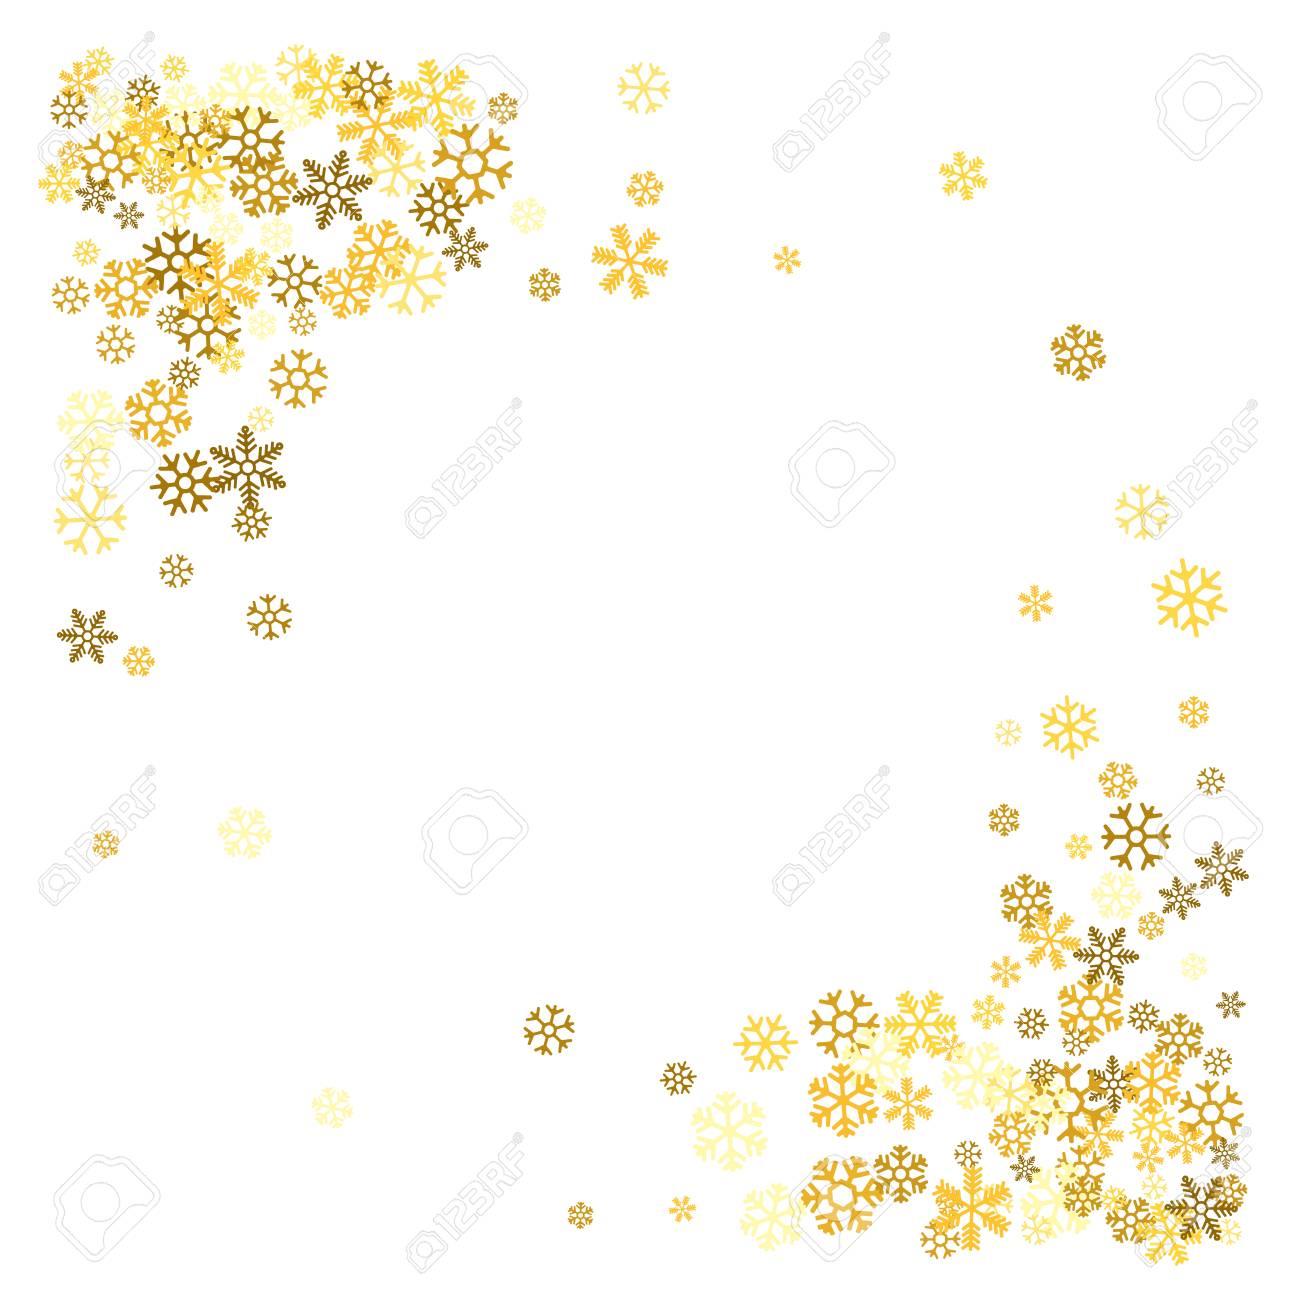 9ee0683b33b Square corner gold frame or border of scatter golden snowflakes on white  background. Design element